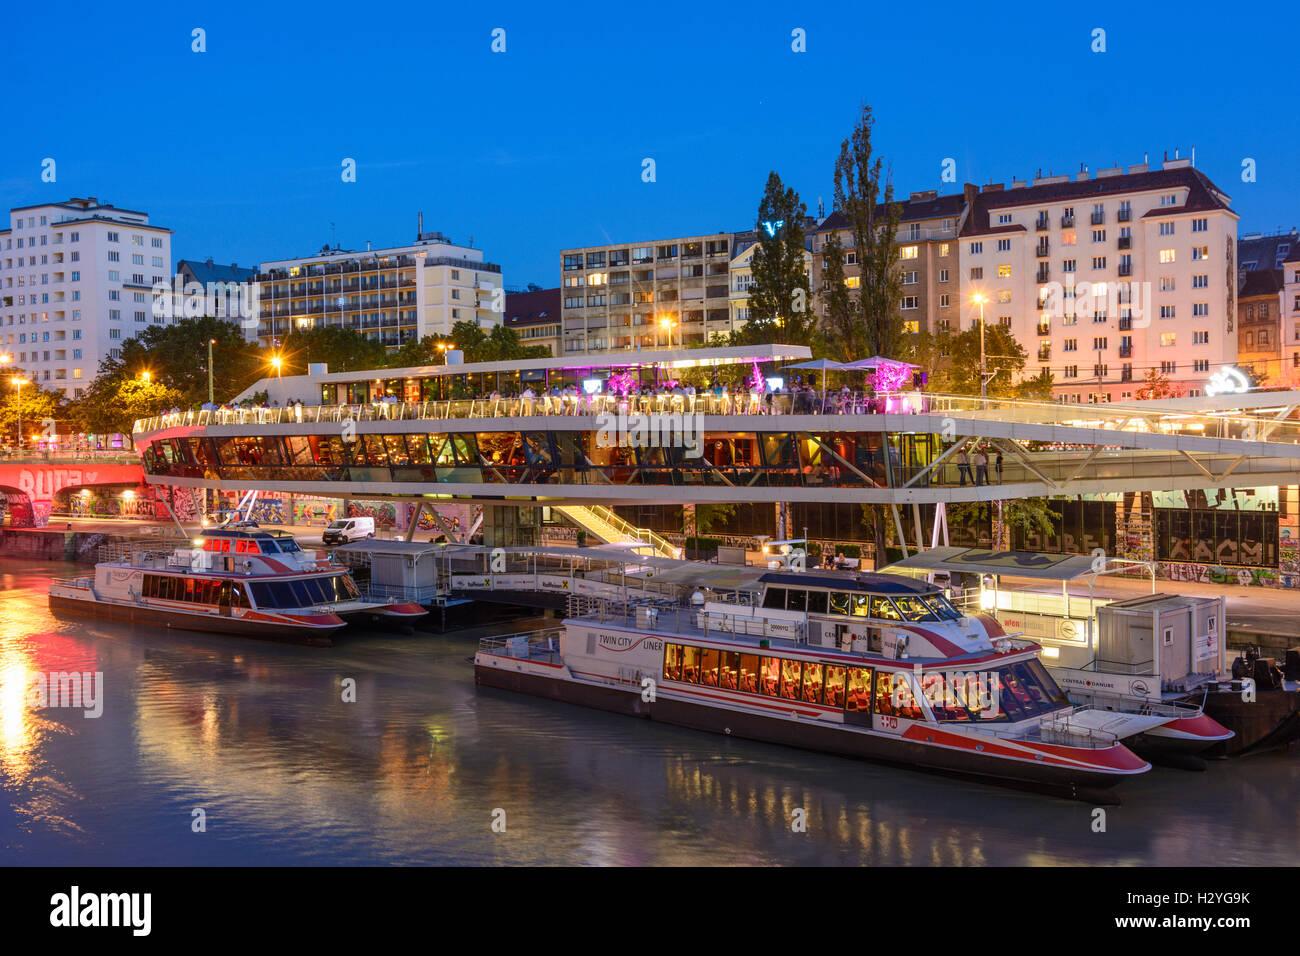 Danube Canal Tour